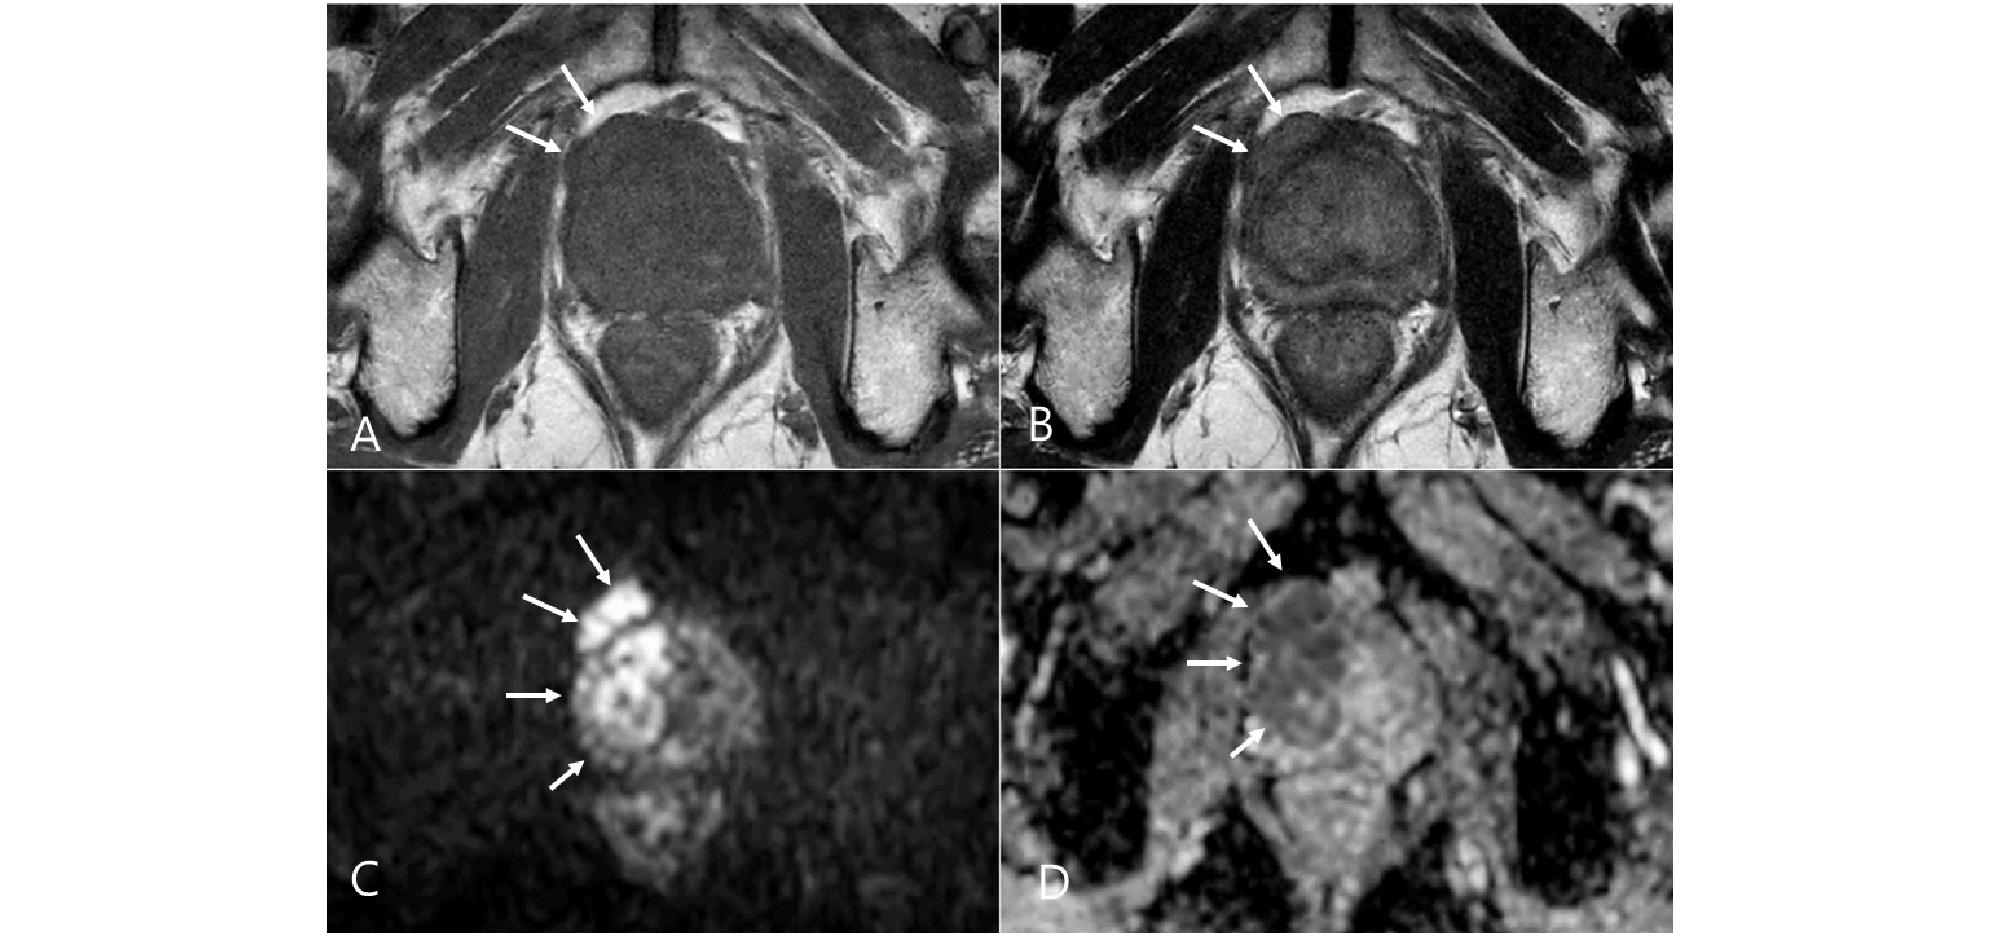 http://static.apub.kr/journalsite/sites/urology/2020-001-02/N0050010202/images/urology_01_02_02_F3.jpg